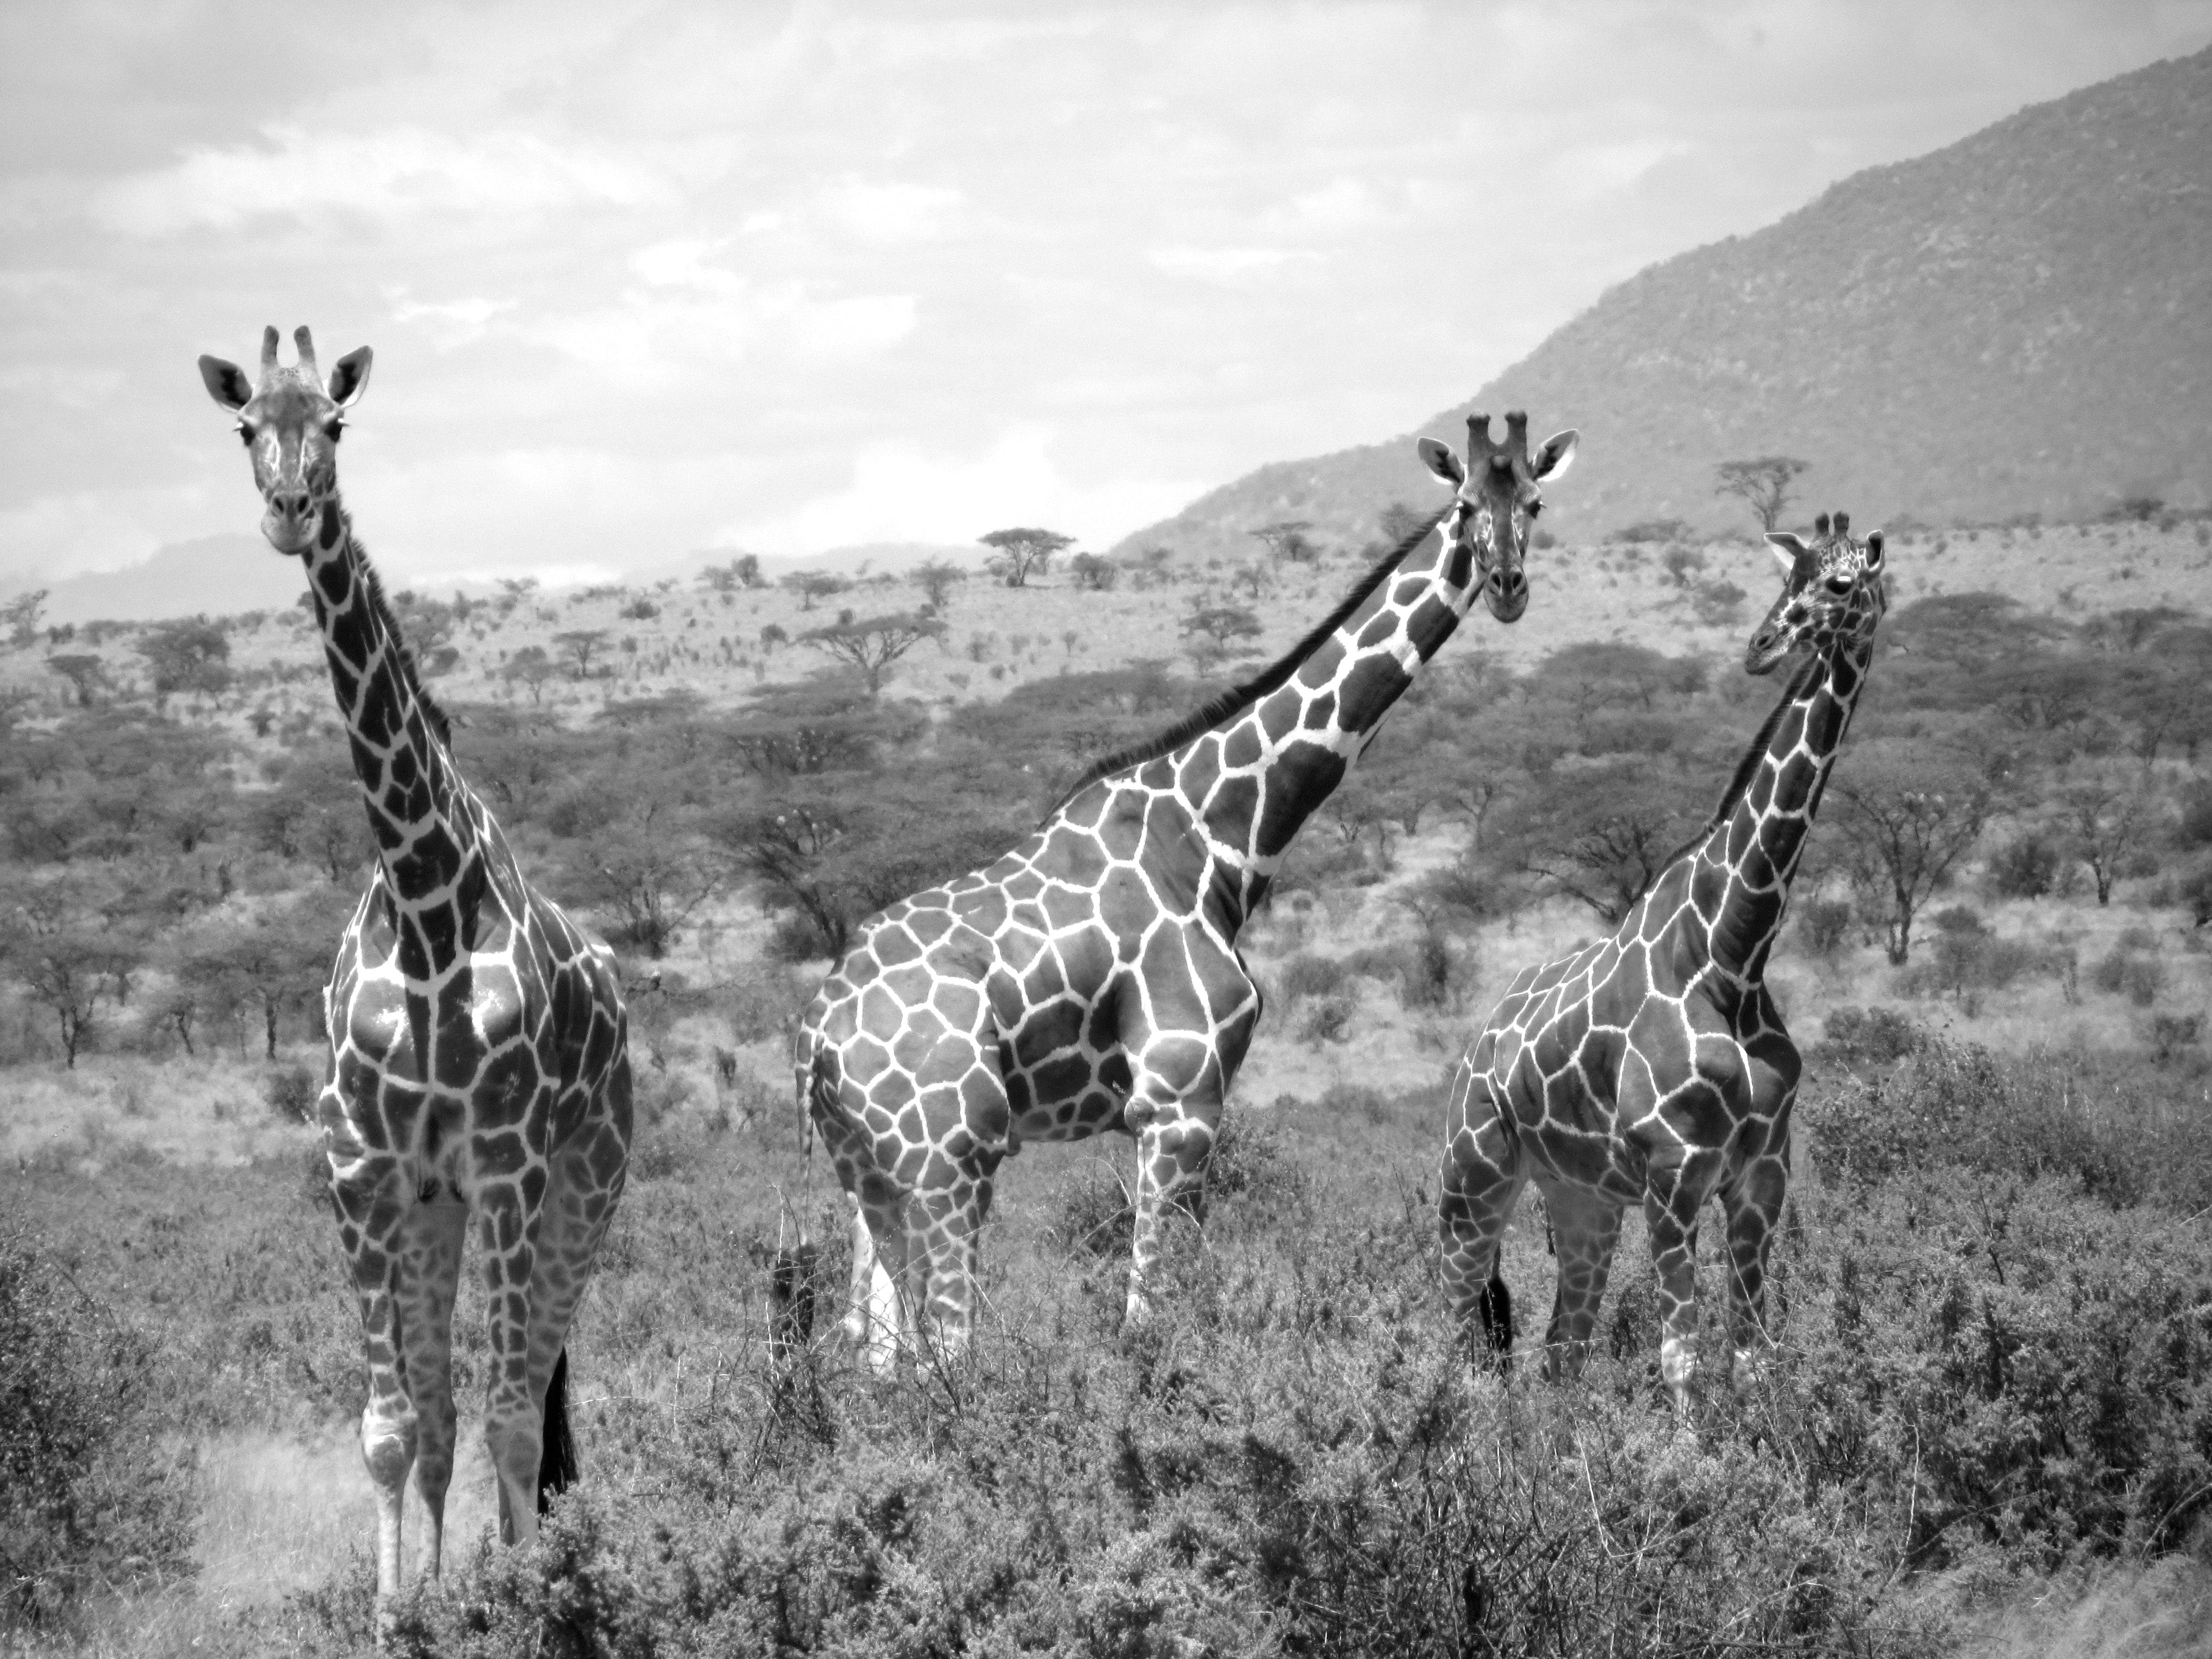 Free stock photo of b&w, Girrafe, safari